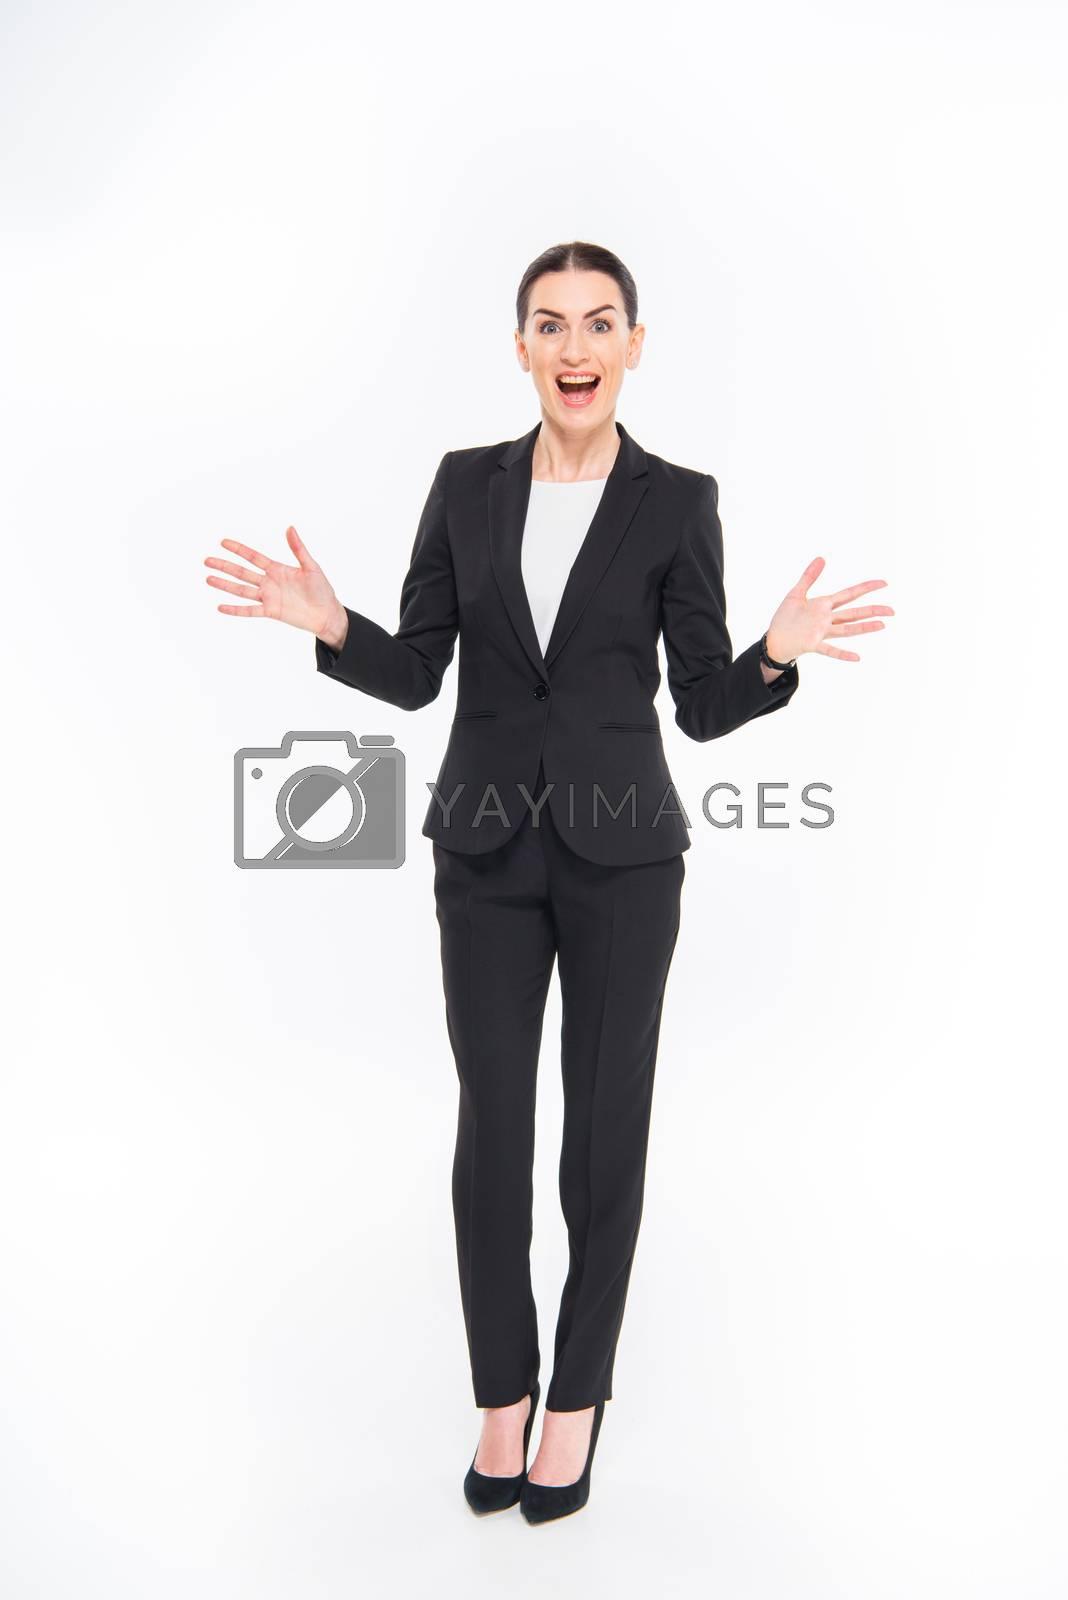 Royalty free image of Shocked businesswoman gesturing  by LightFieldStudios